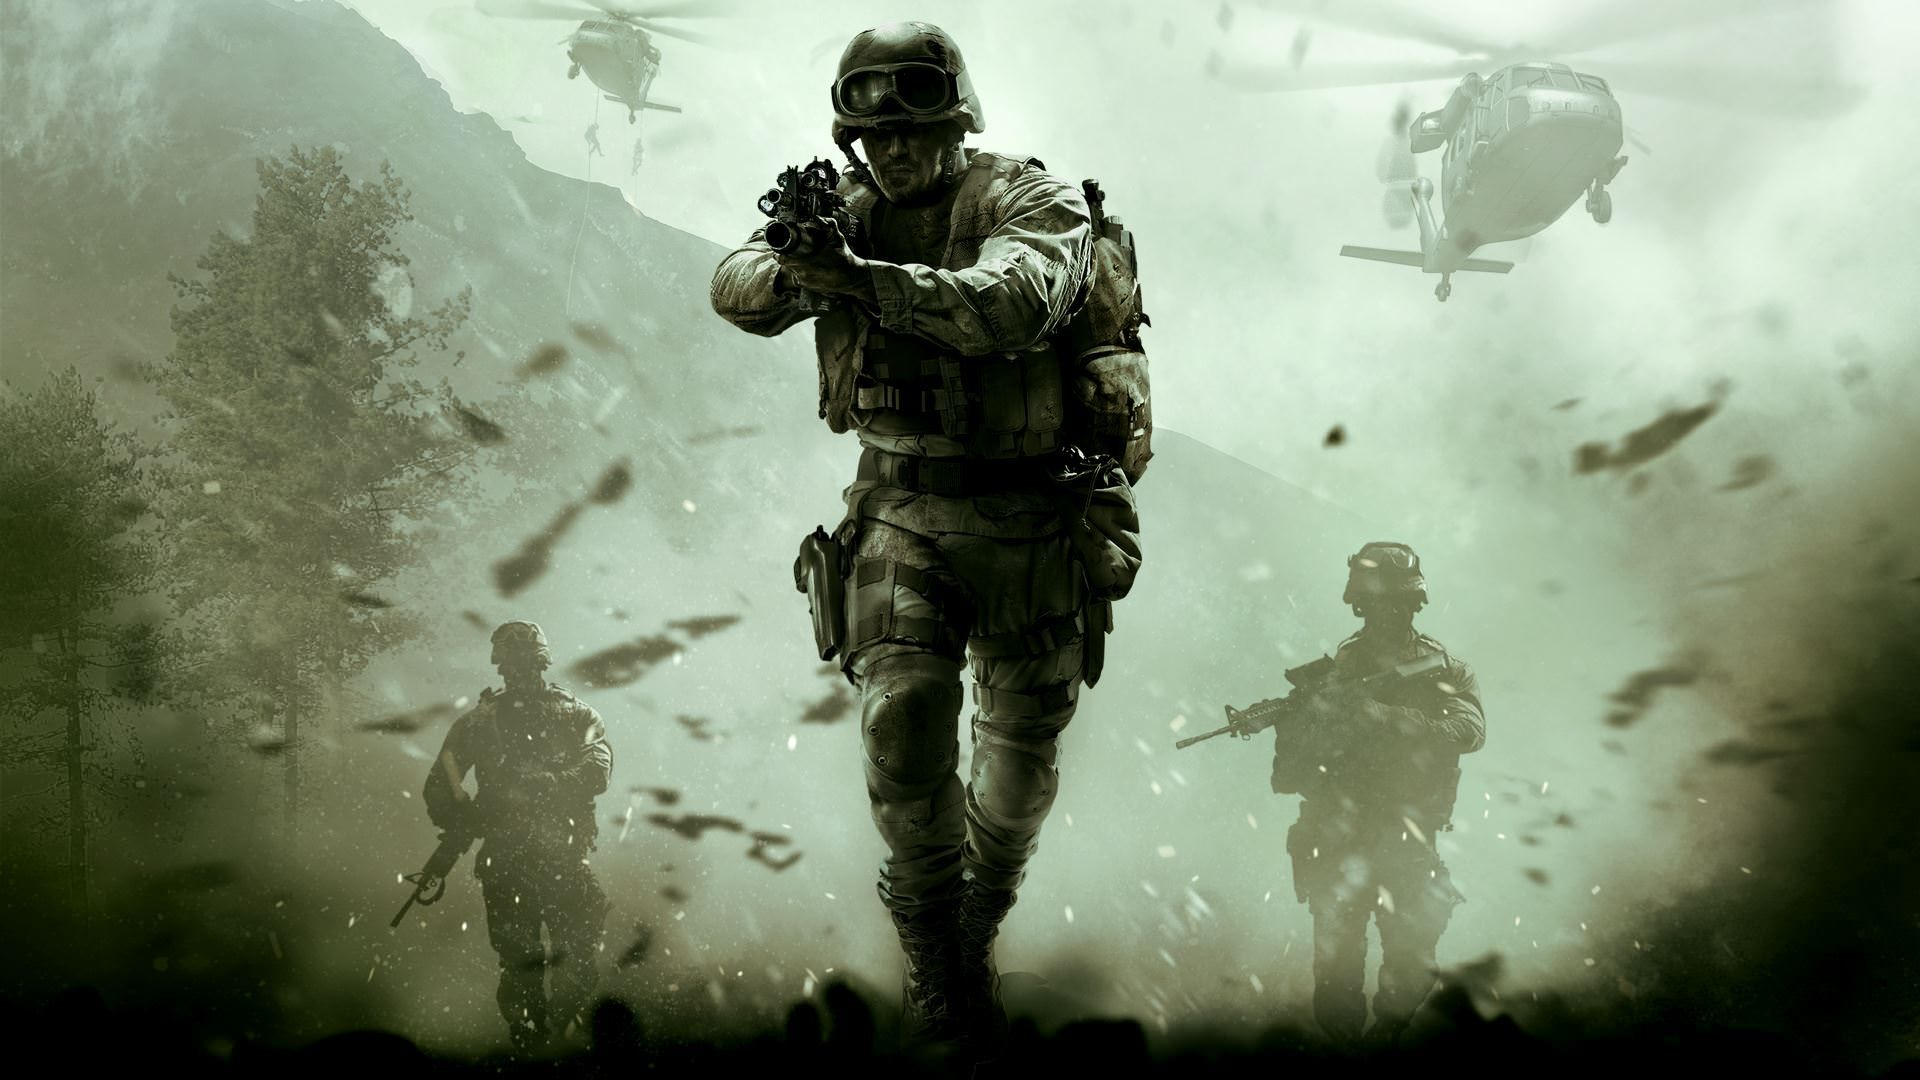 10 Years Ago Call Of Duty Modern Warfare Made An Everlasting